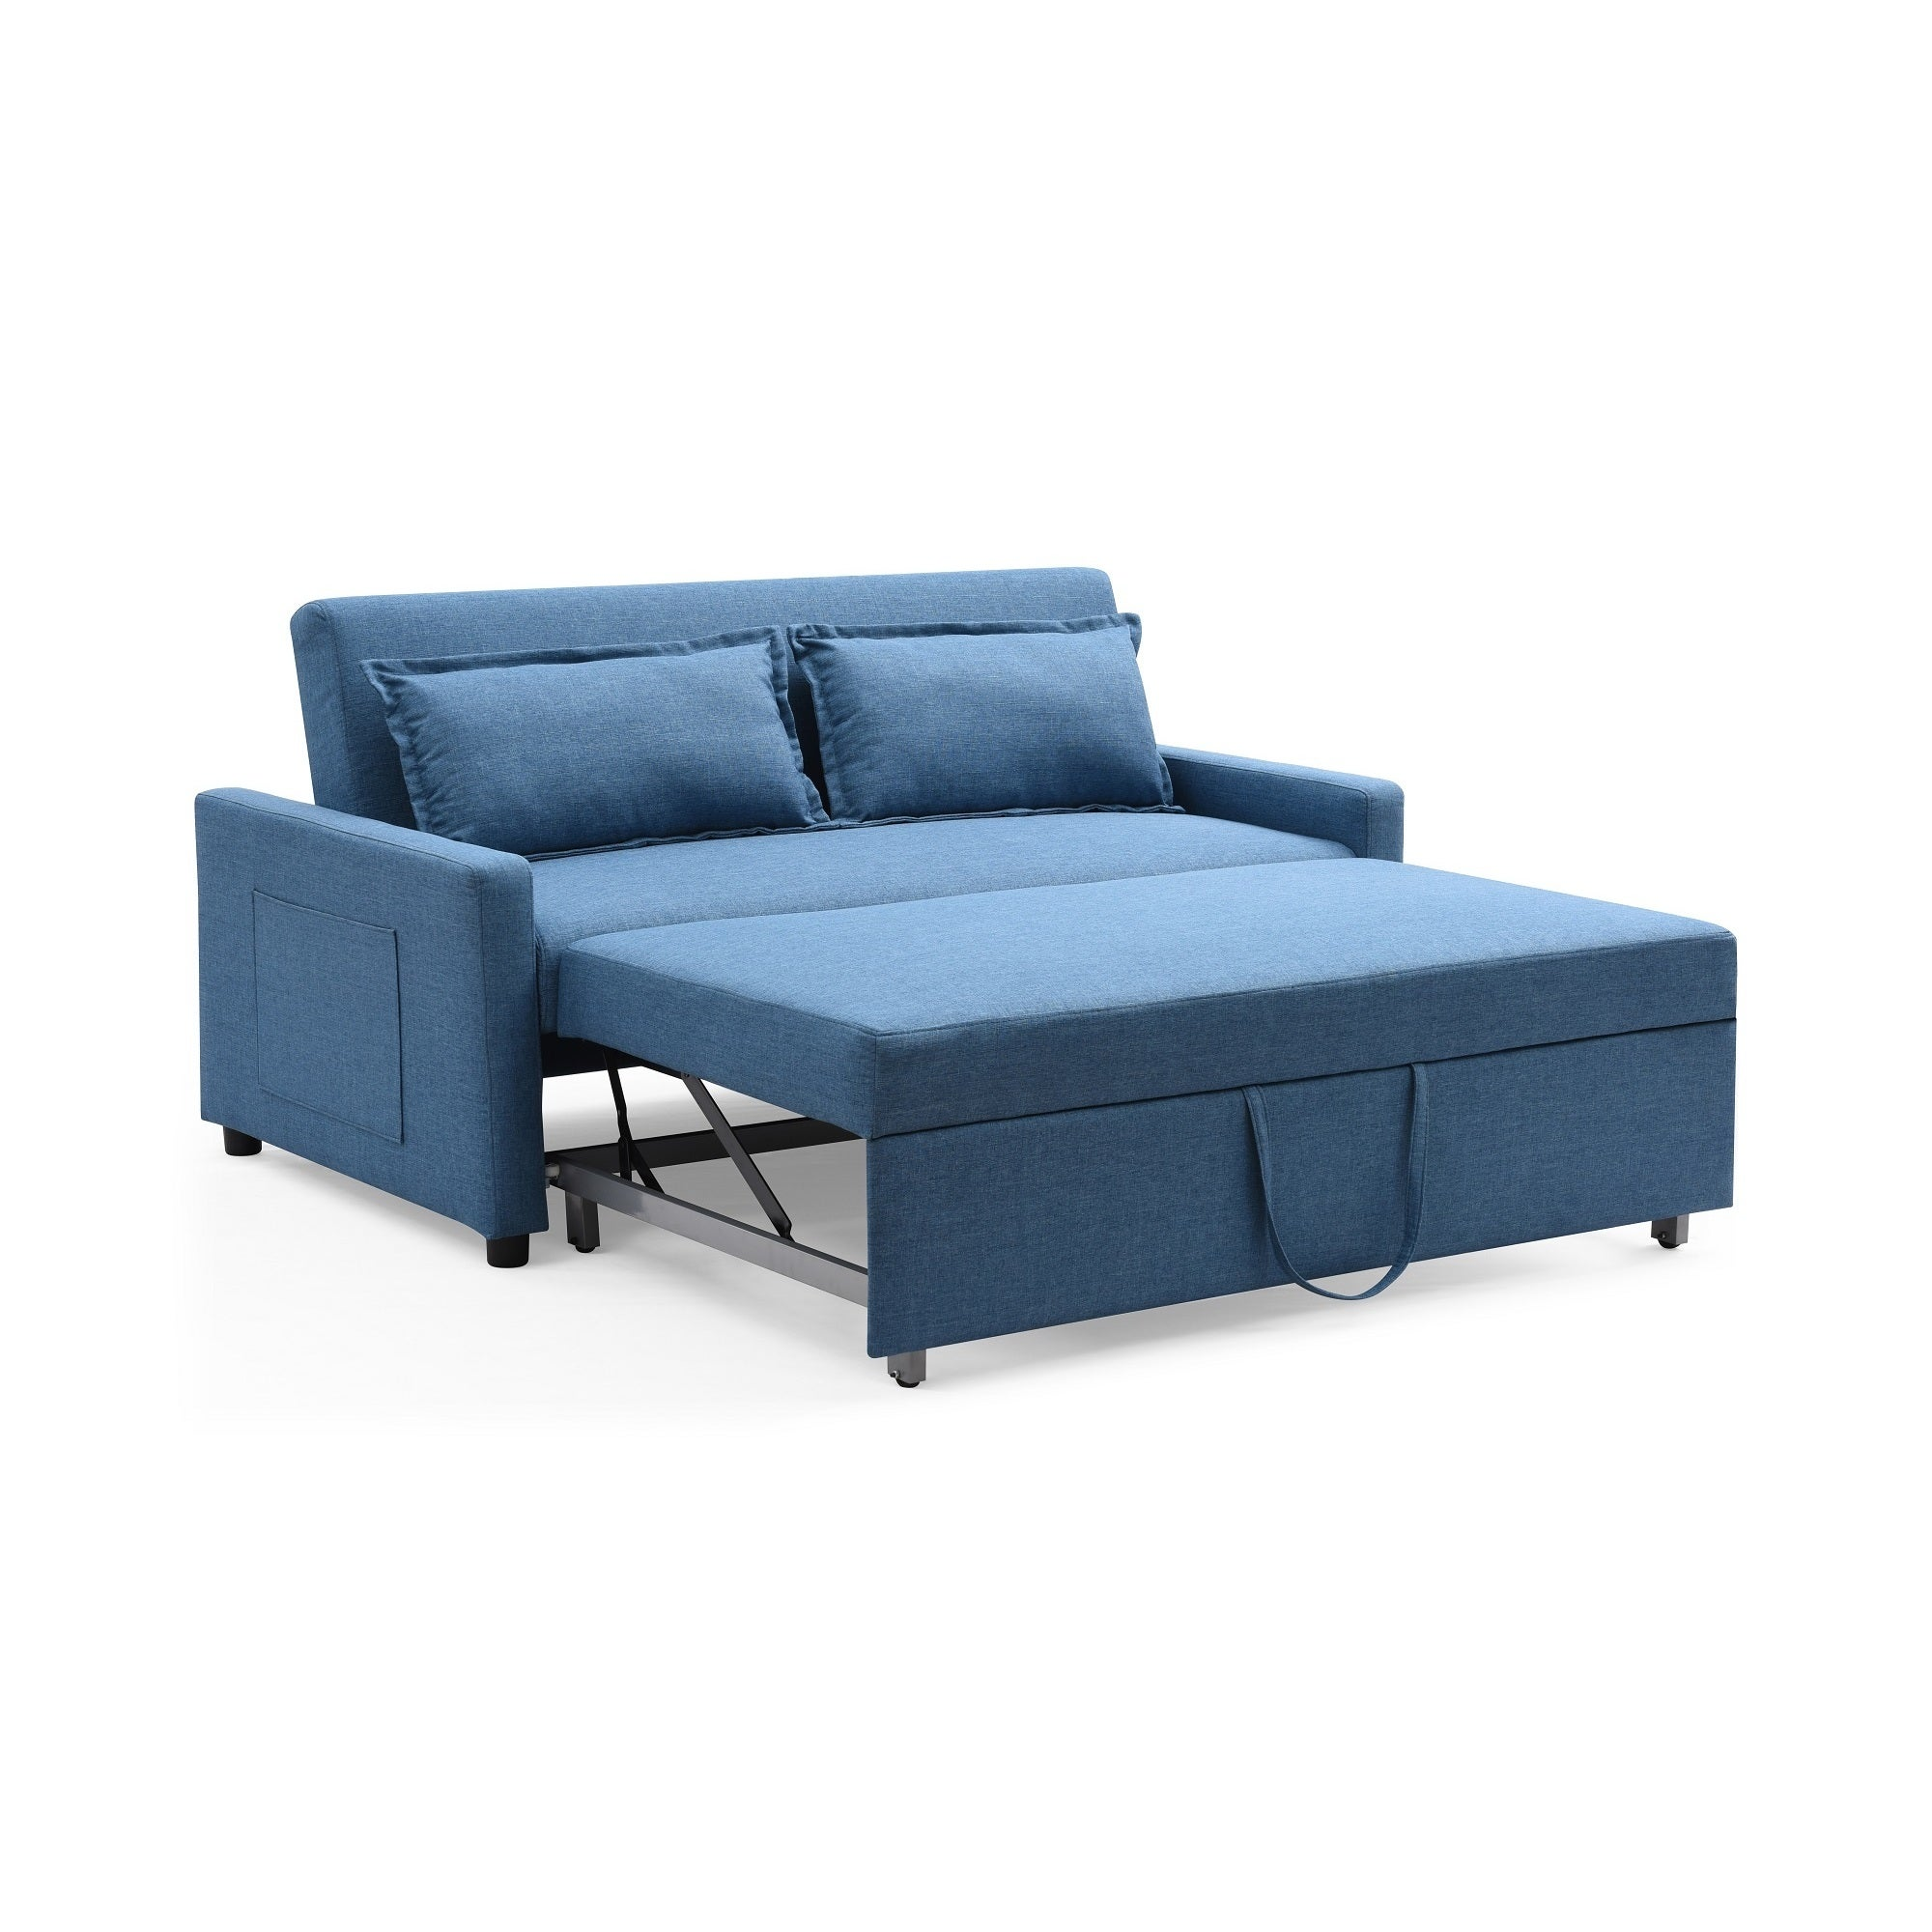 Castro Convertible Bed